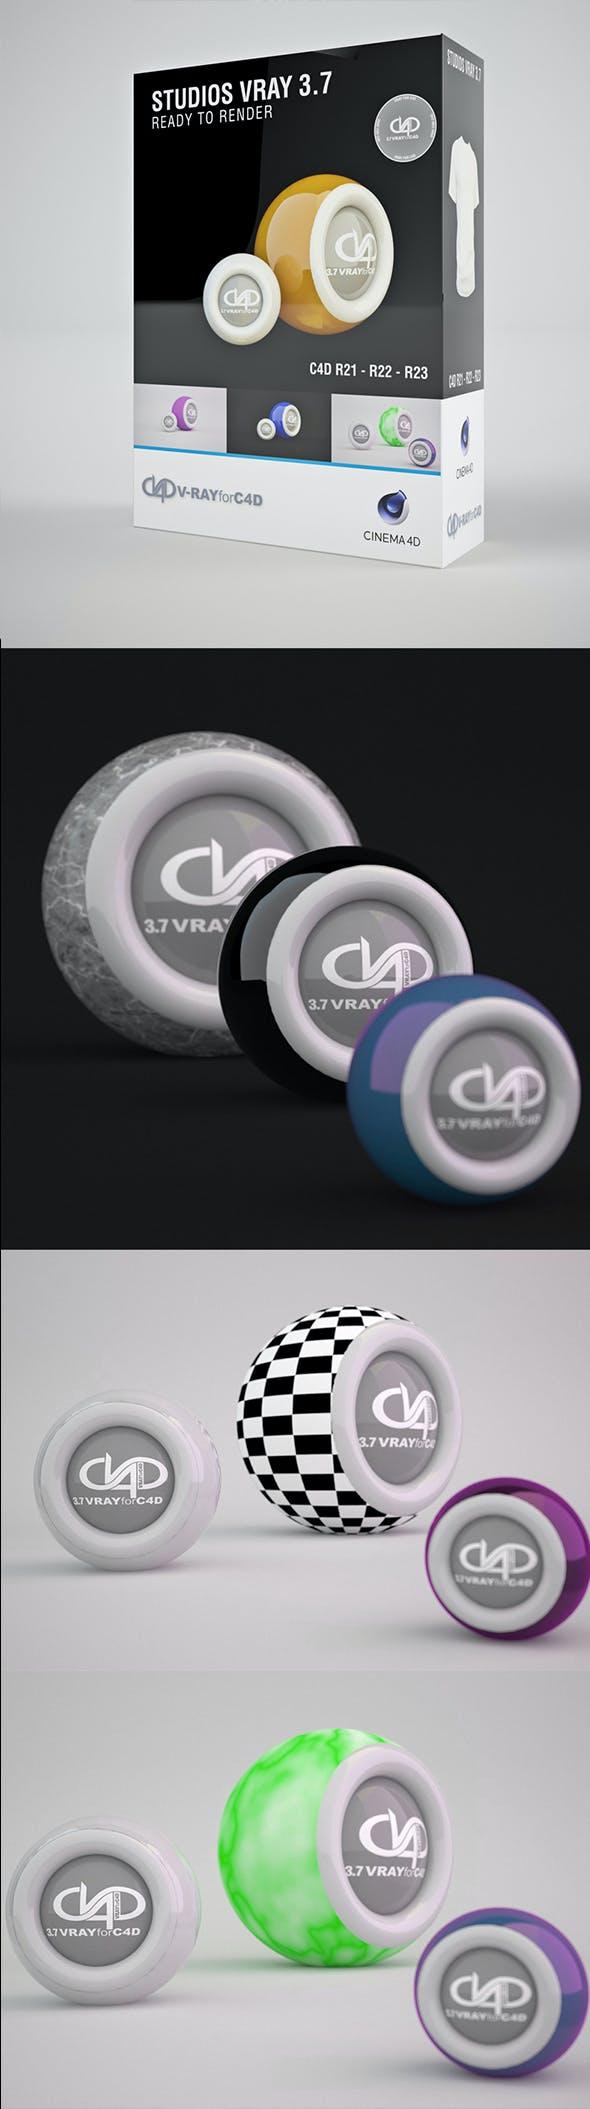 Dof Studio Vray 3.7 C4D R20 / R21 / R22 / R23 - 3DOcean Item for Sale